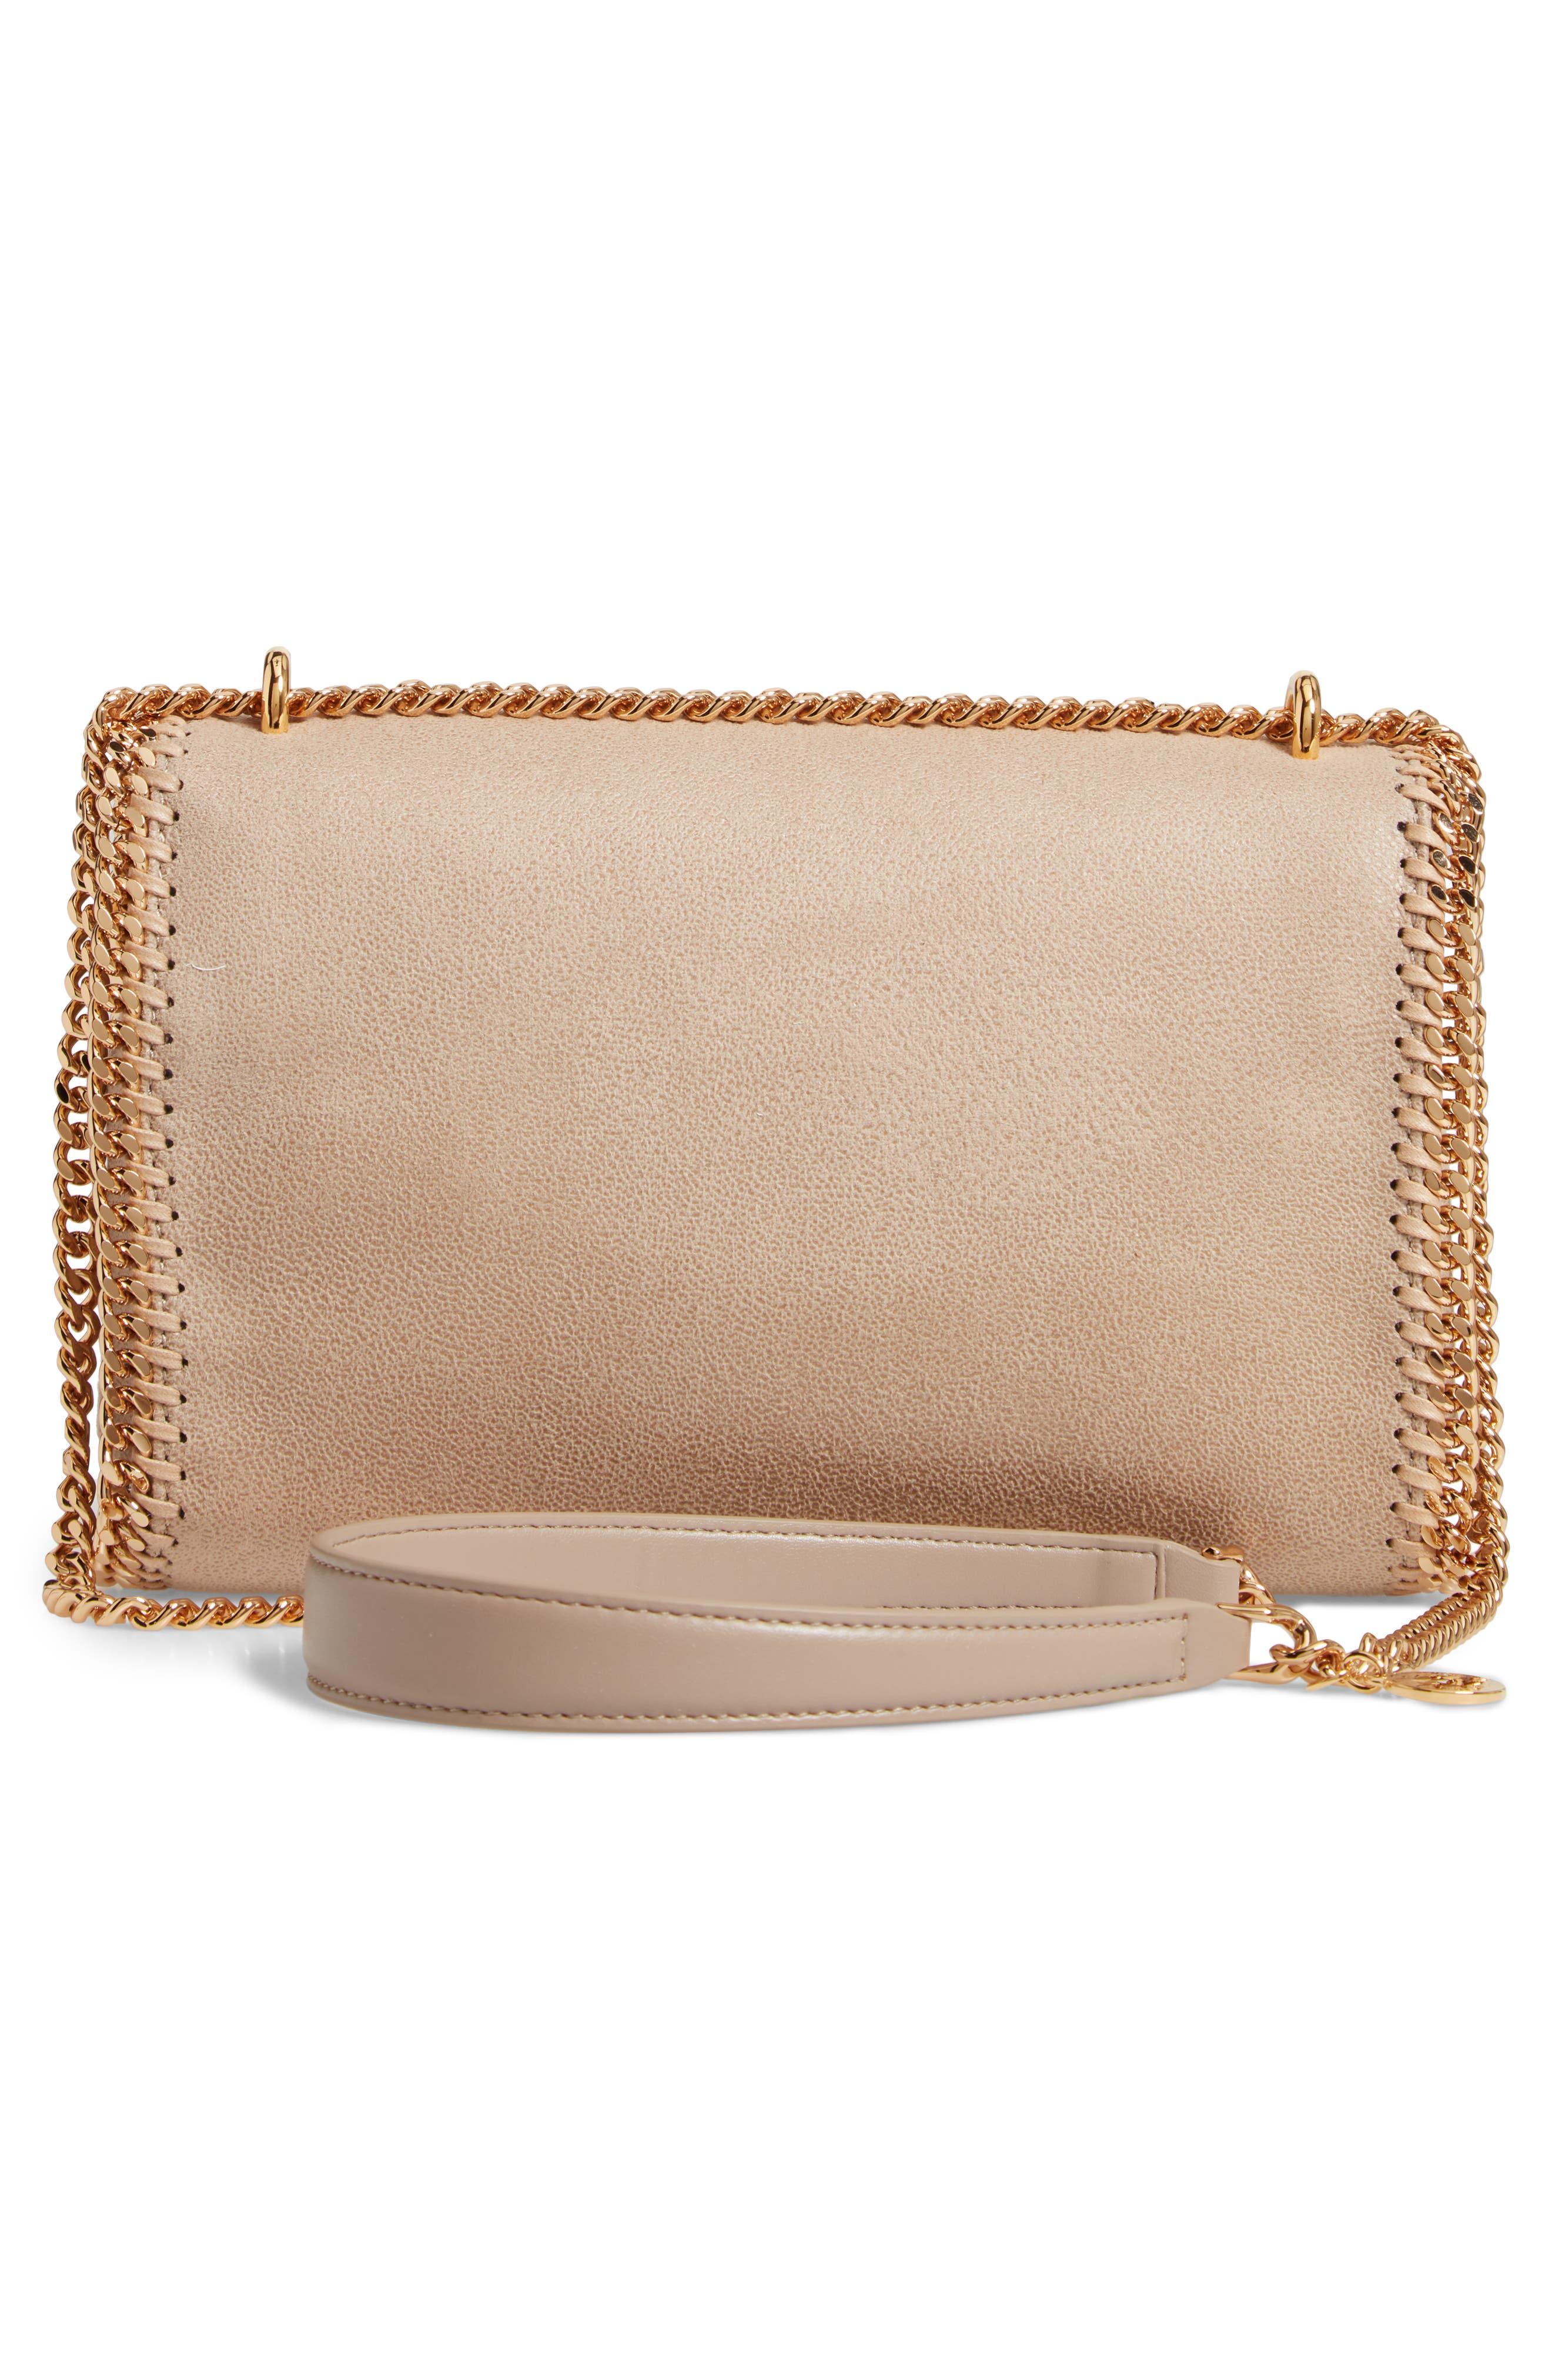 STELLA MCCARTNEY, Falabella Shaggy Deer Faux Leather Shoulder Bag, Alternate thumbnail 4, color, CLOTTED CREAM